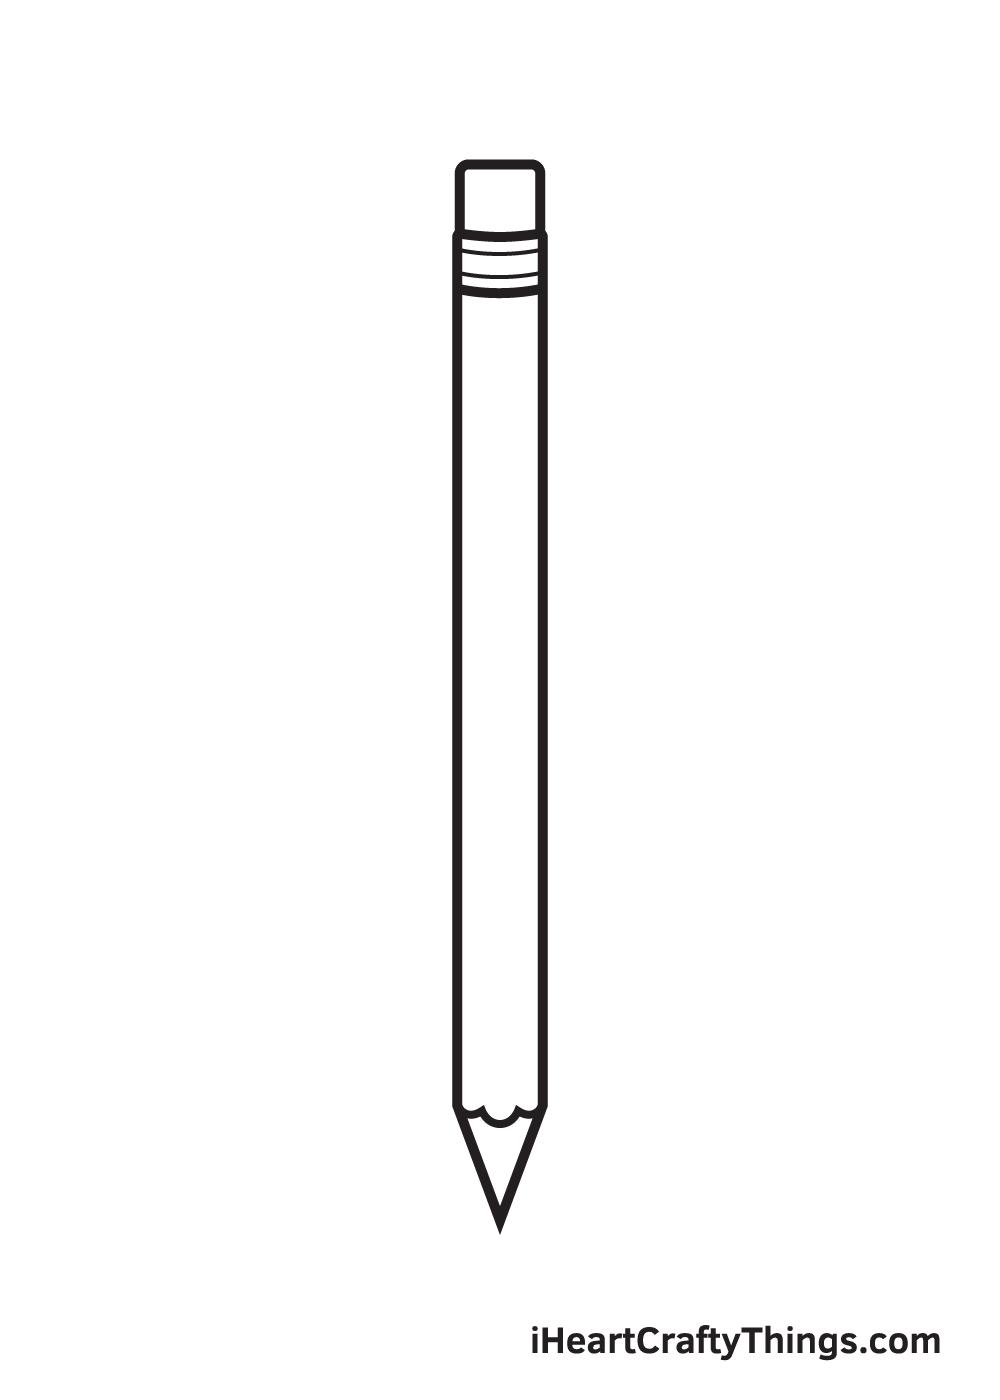 pencil drawing step 7